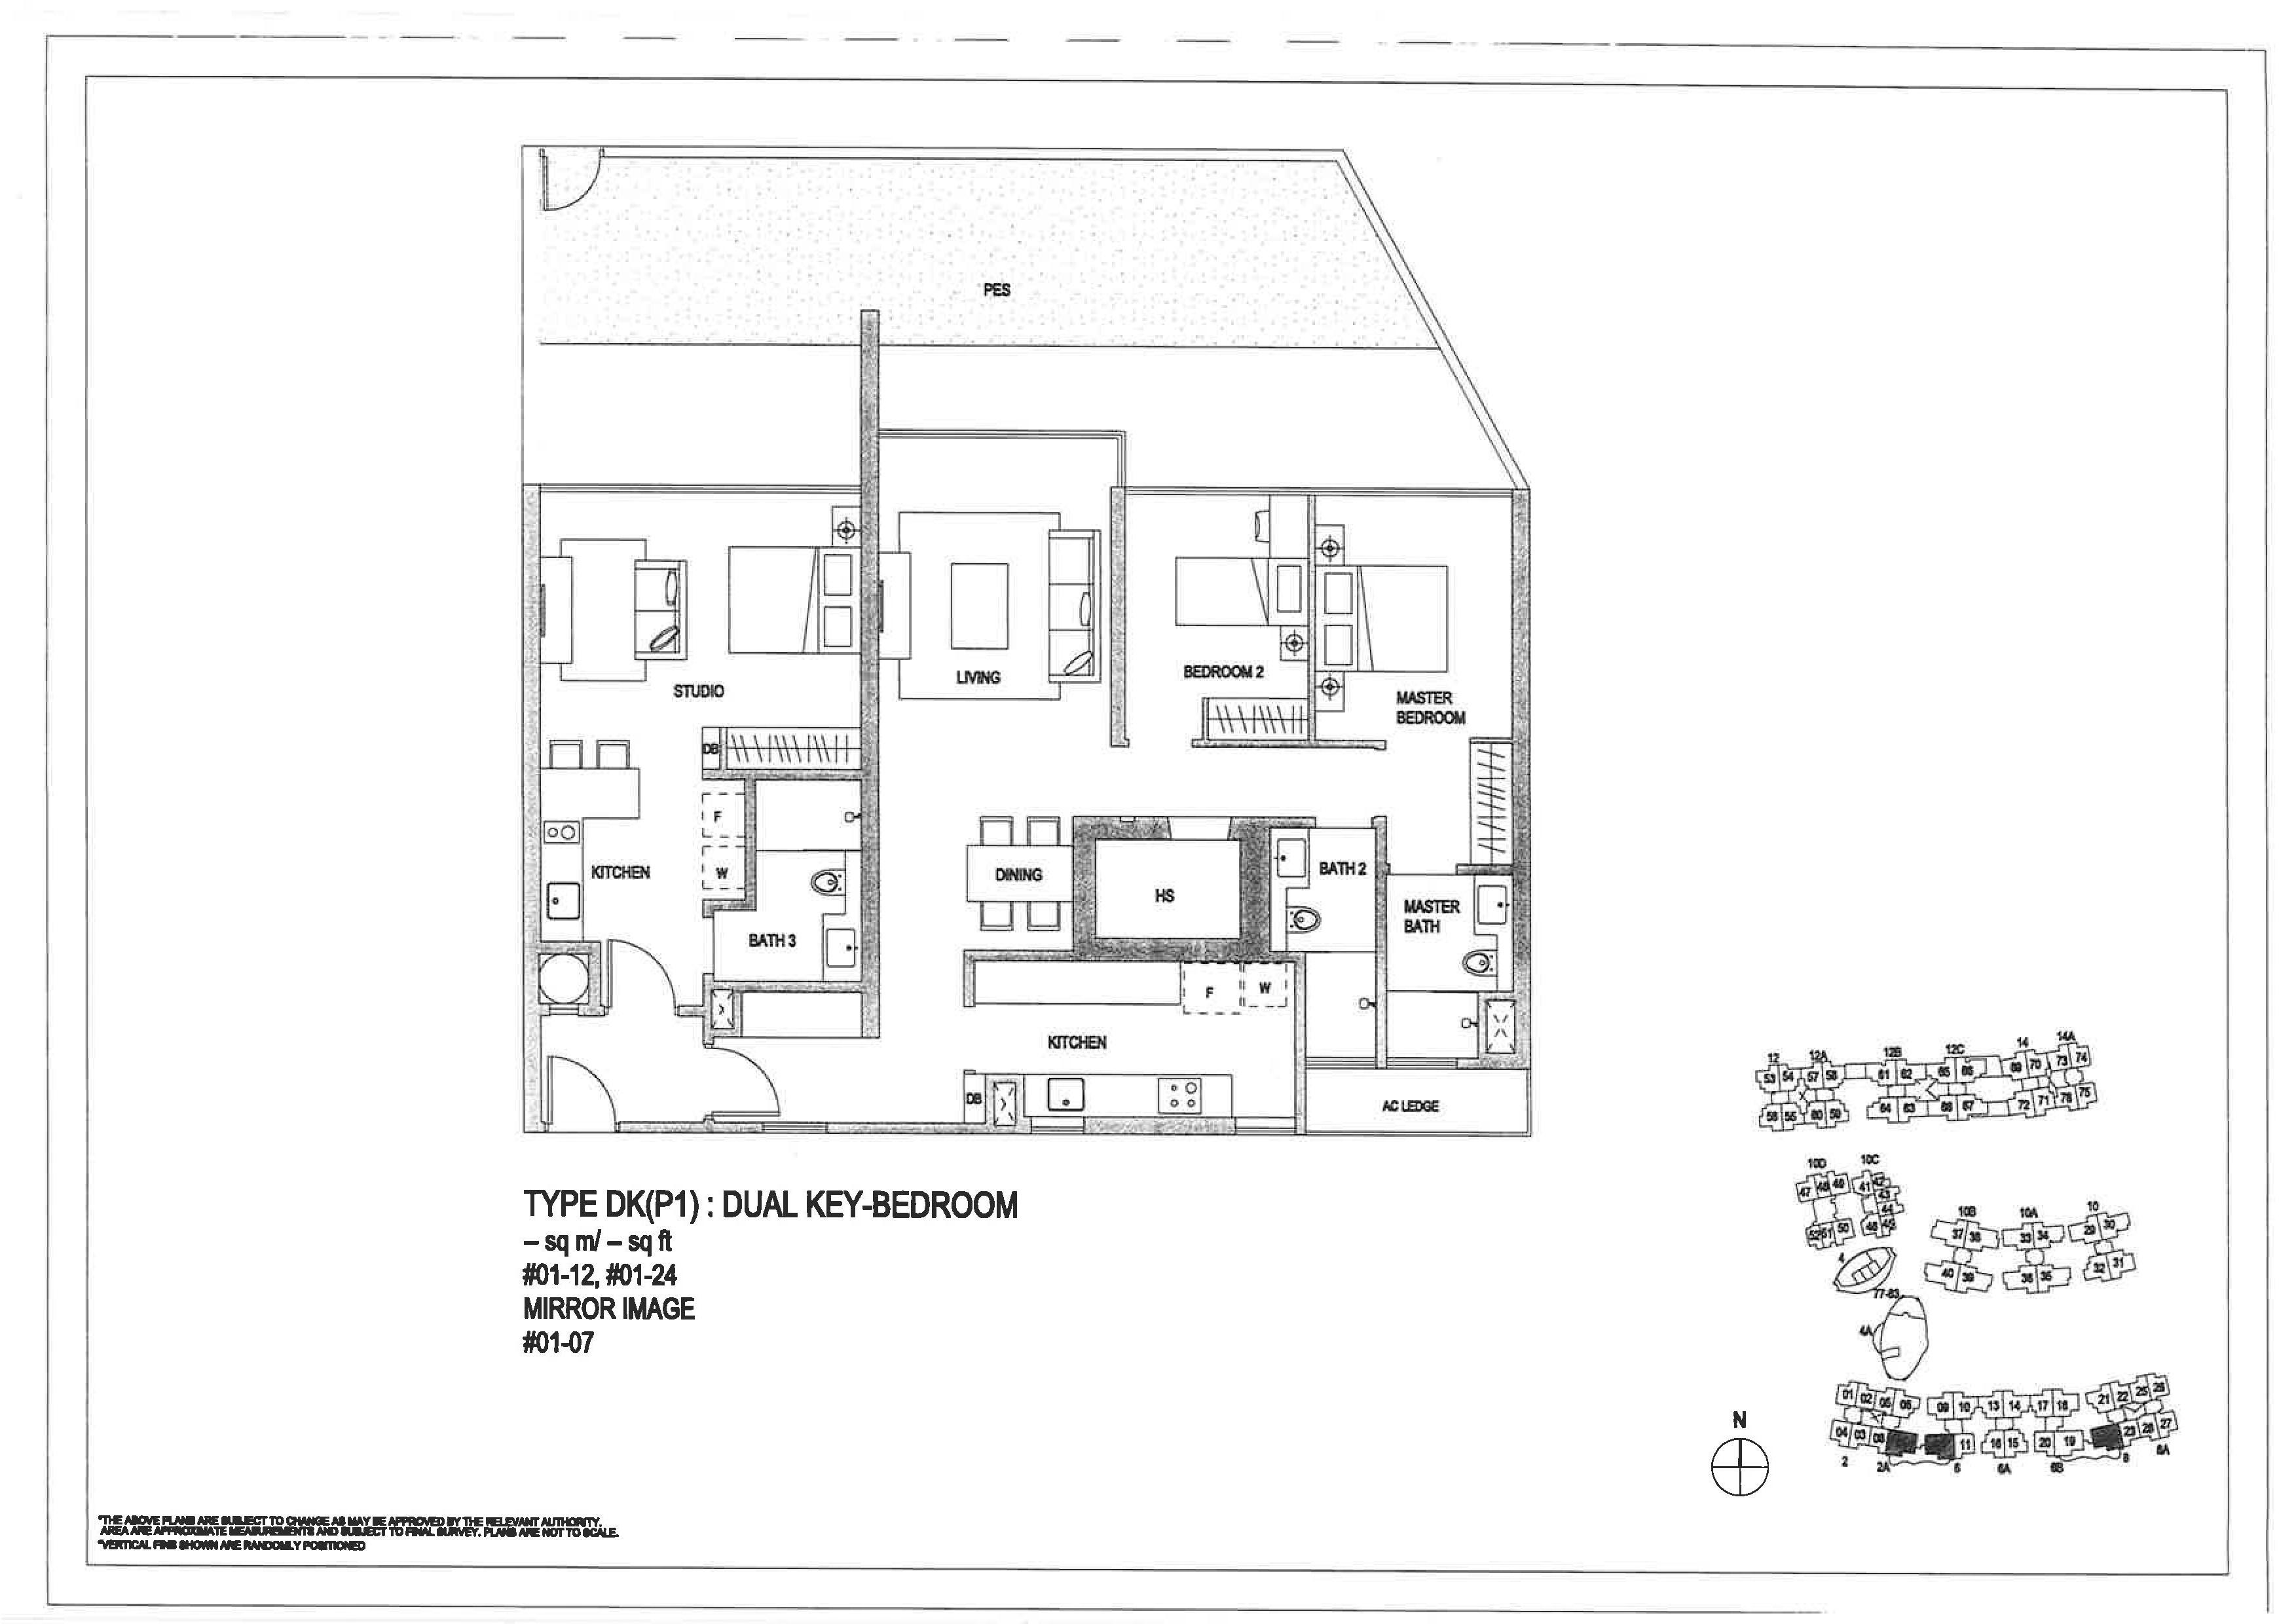 The Minton 3 Bedroom Dual Key Floor Plans Type DK(P1)